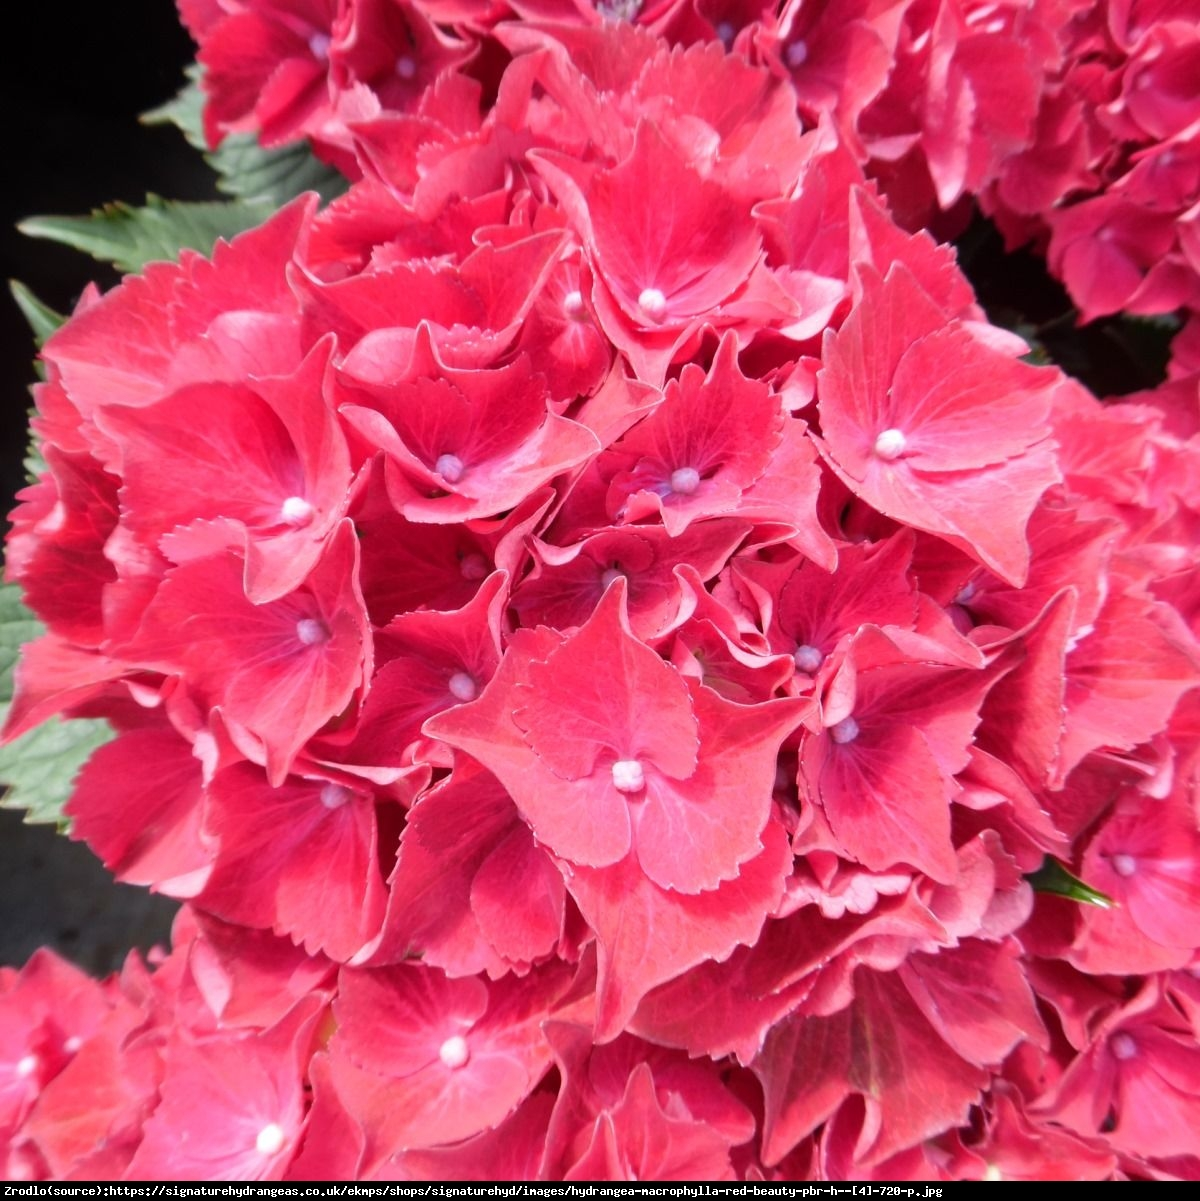 Hortensja ogrodowa Red Beauty Lila  - Hydrangea macrophylla Red Beauty Lila